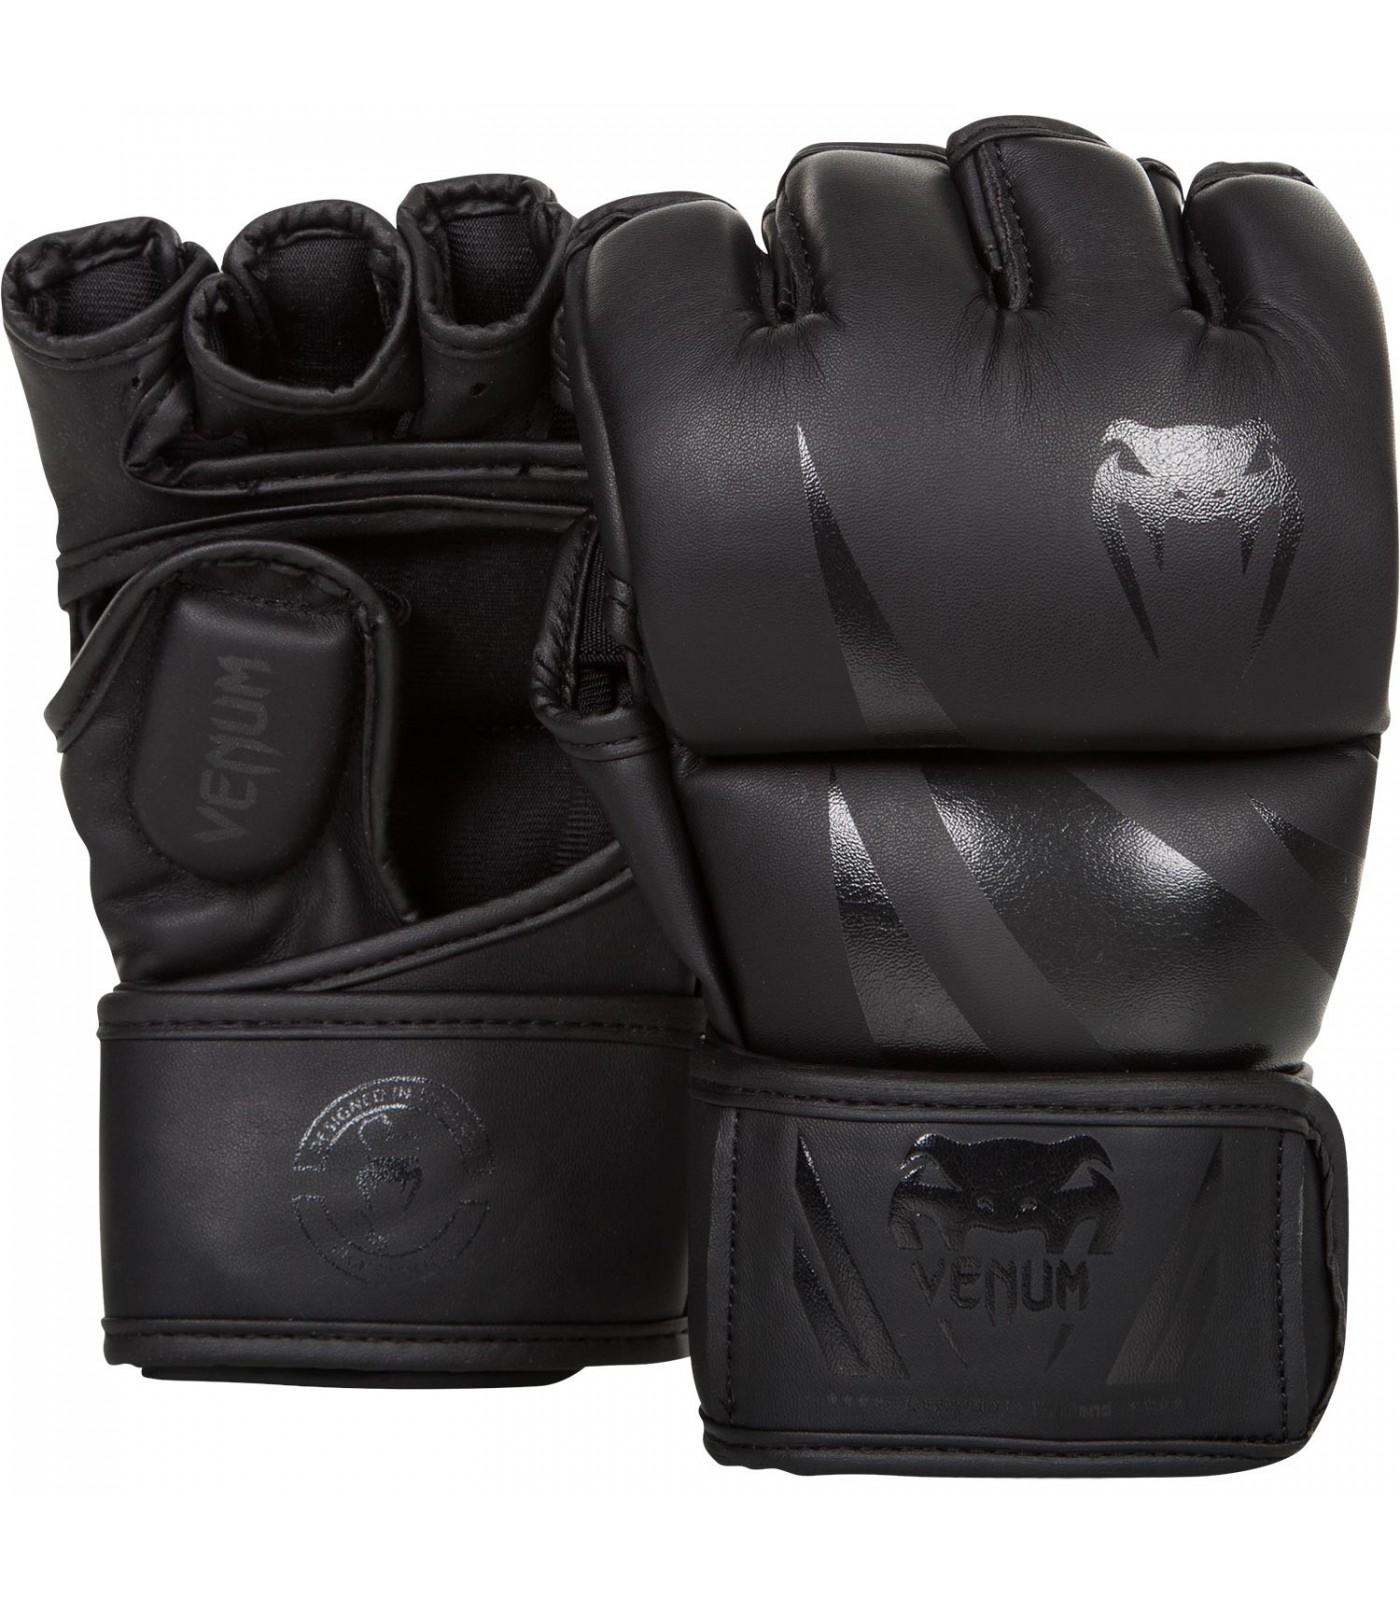 ММА ръкавици - Venum - Challenger MMA Gloves - Black/Black